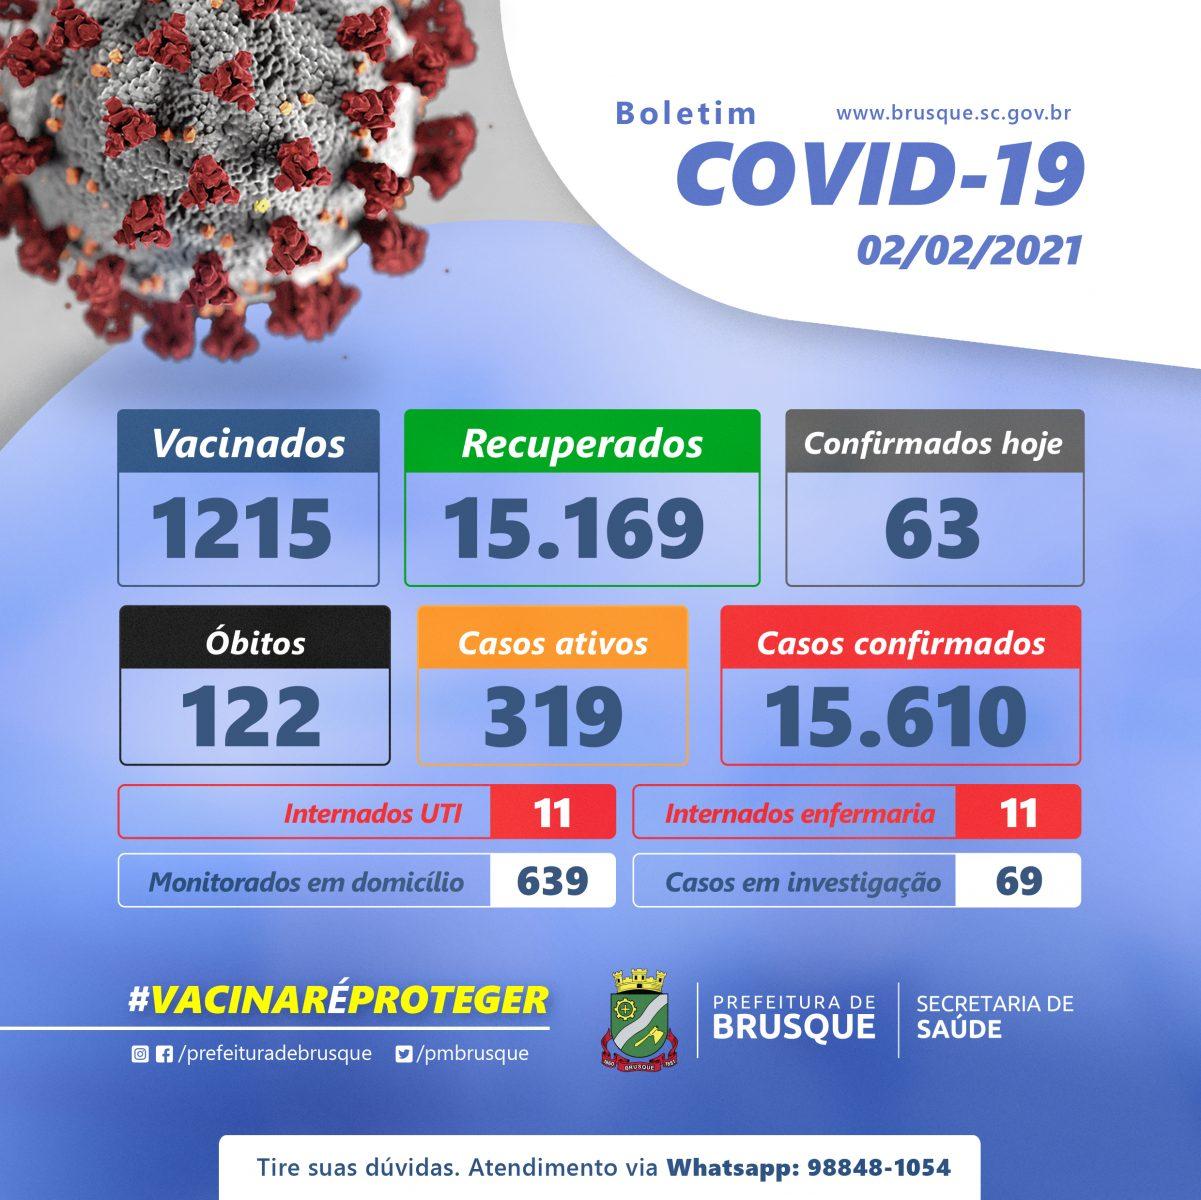 Covid-19: Confira o boletim epidemiológico desta terça-feira (2)